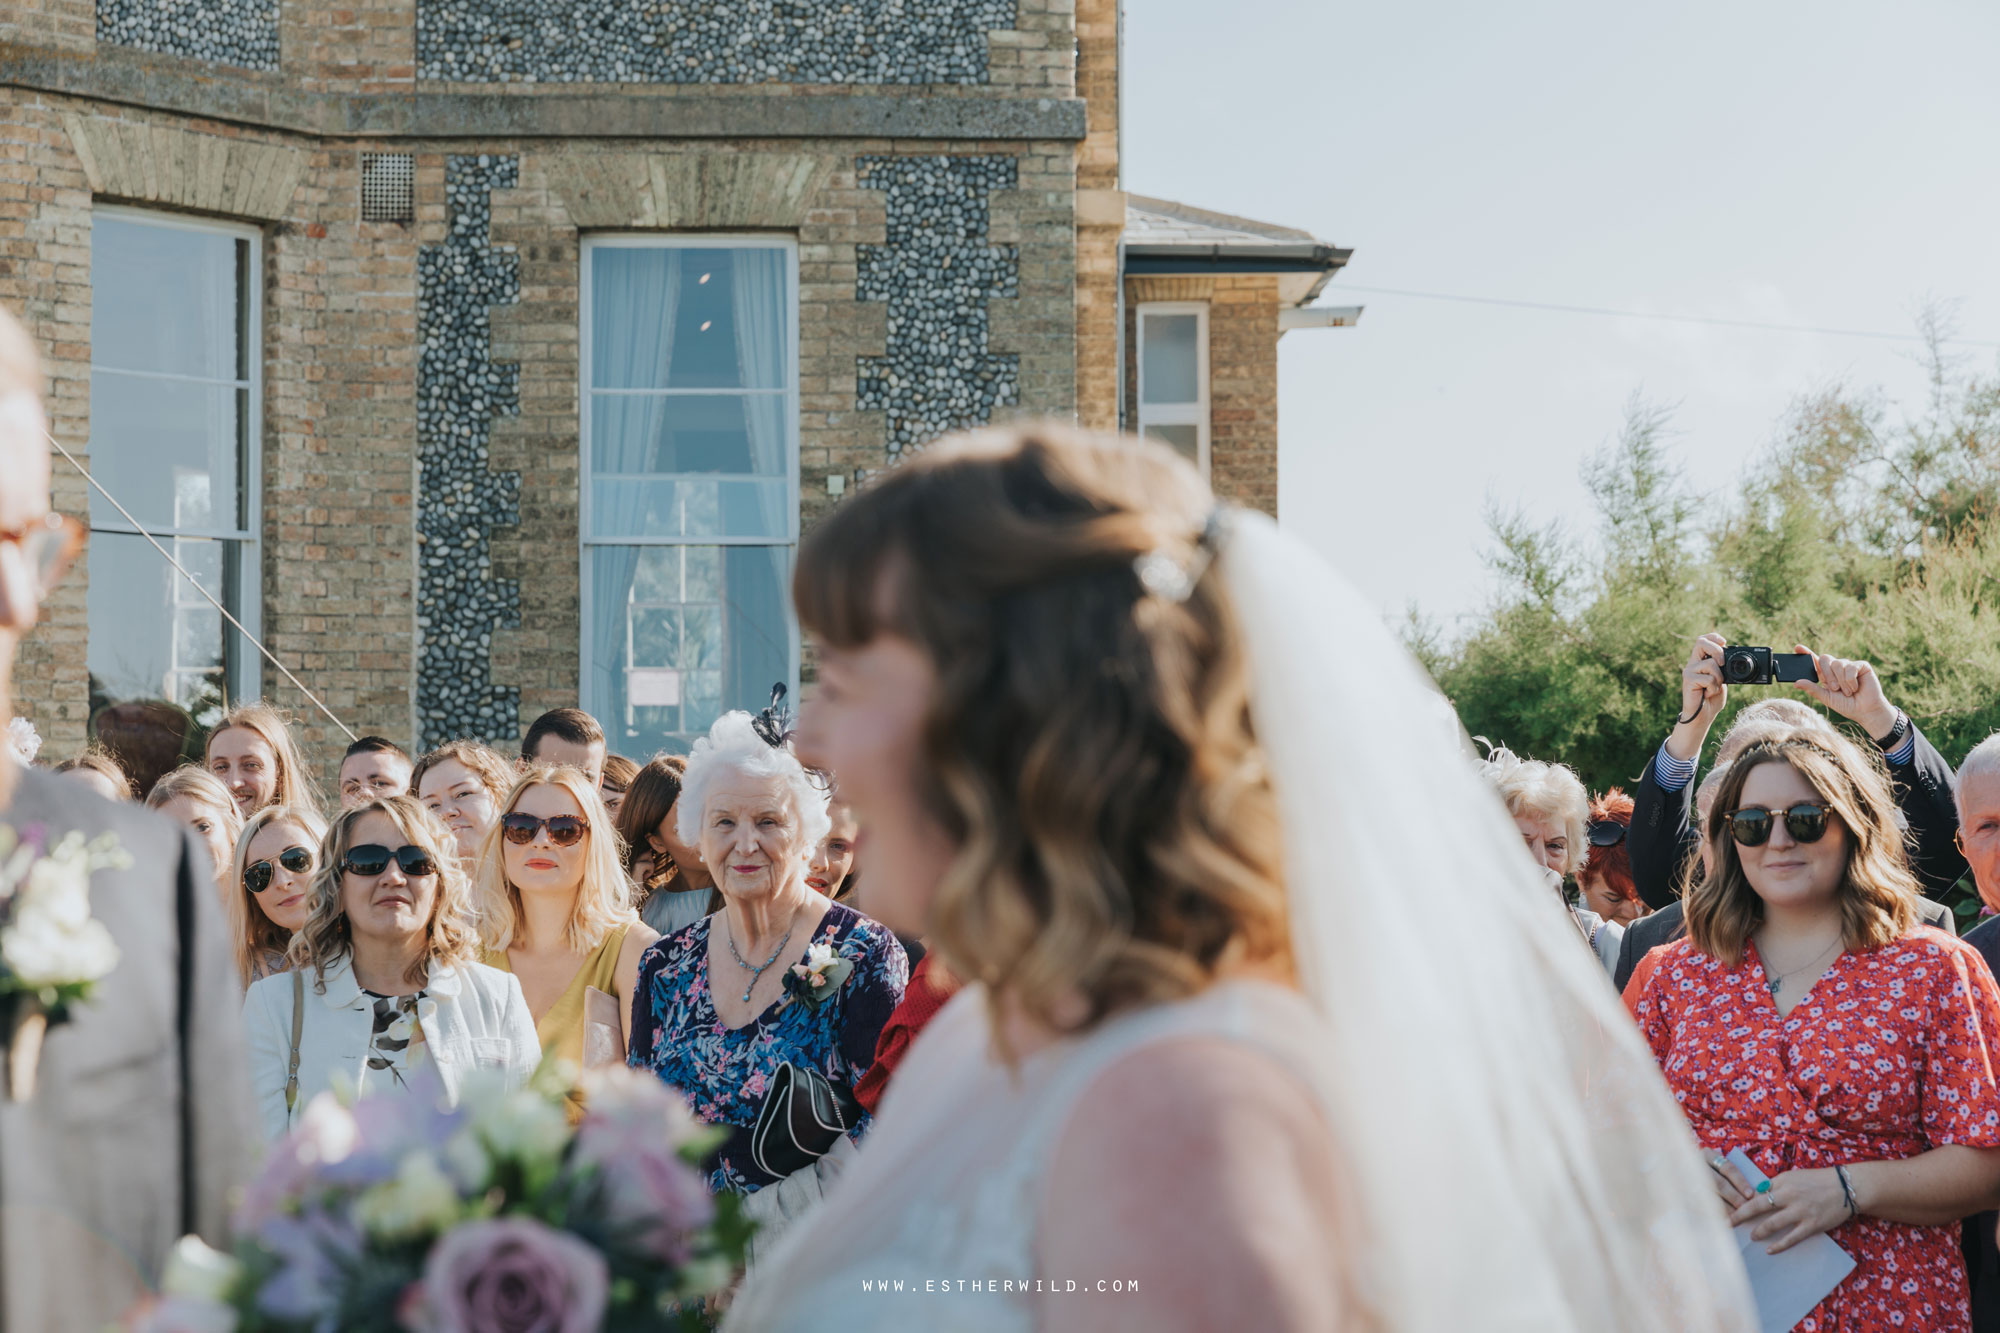 Cromer_Wedding_Beach_Outdoor_Ceremony_Norfolk_North_Lodge_Registry_Office_Rocket_House_Cafe_Cromer_Pier_IMG_3765.jpg